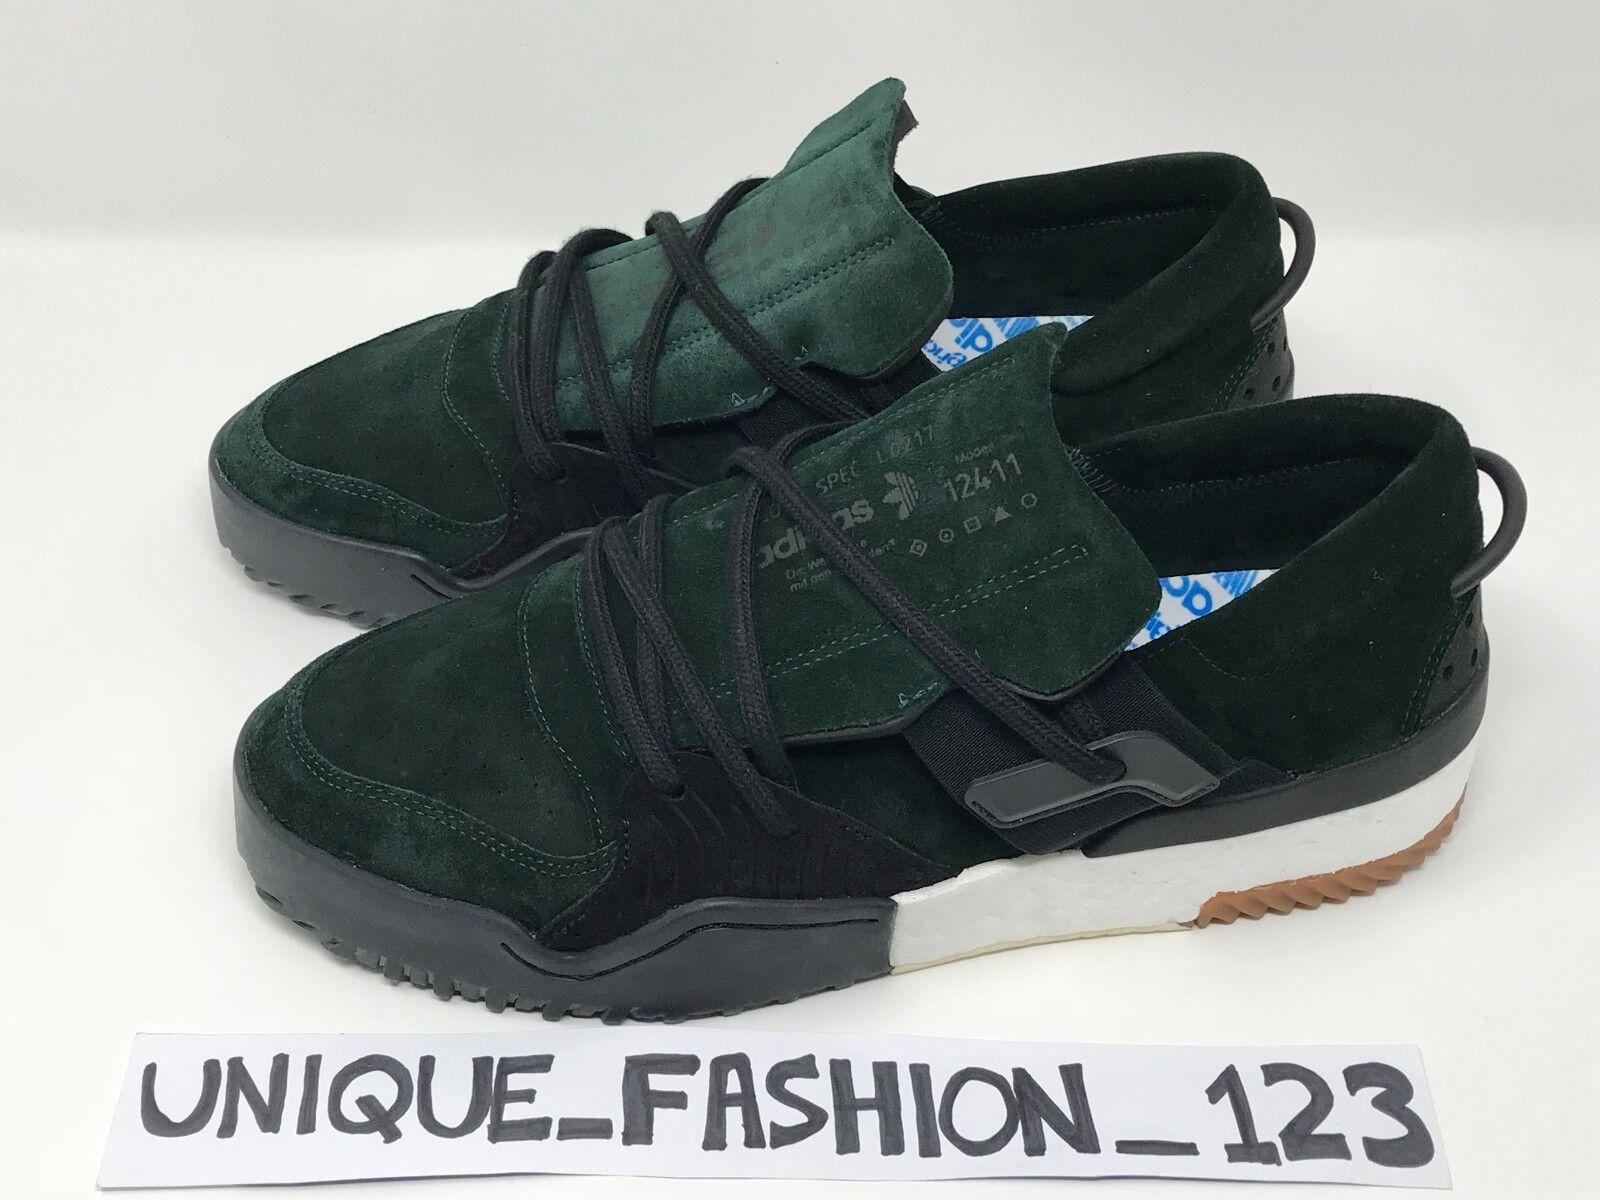 Adidas x verde alexander wang bballname basso verde x scuro luce noi 11,5 nero 63cfeb